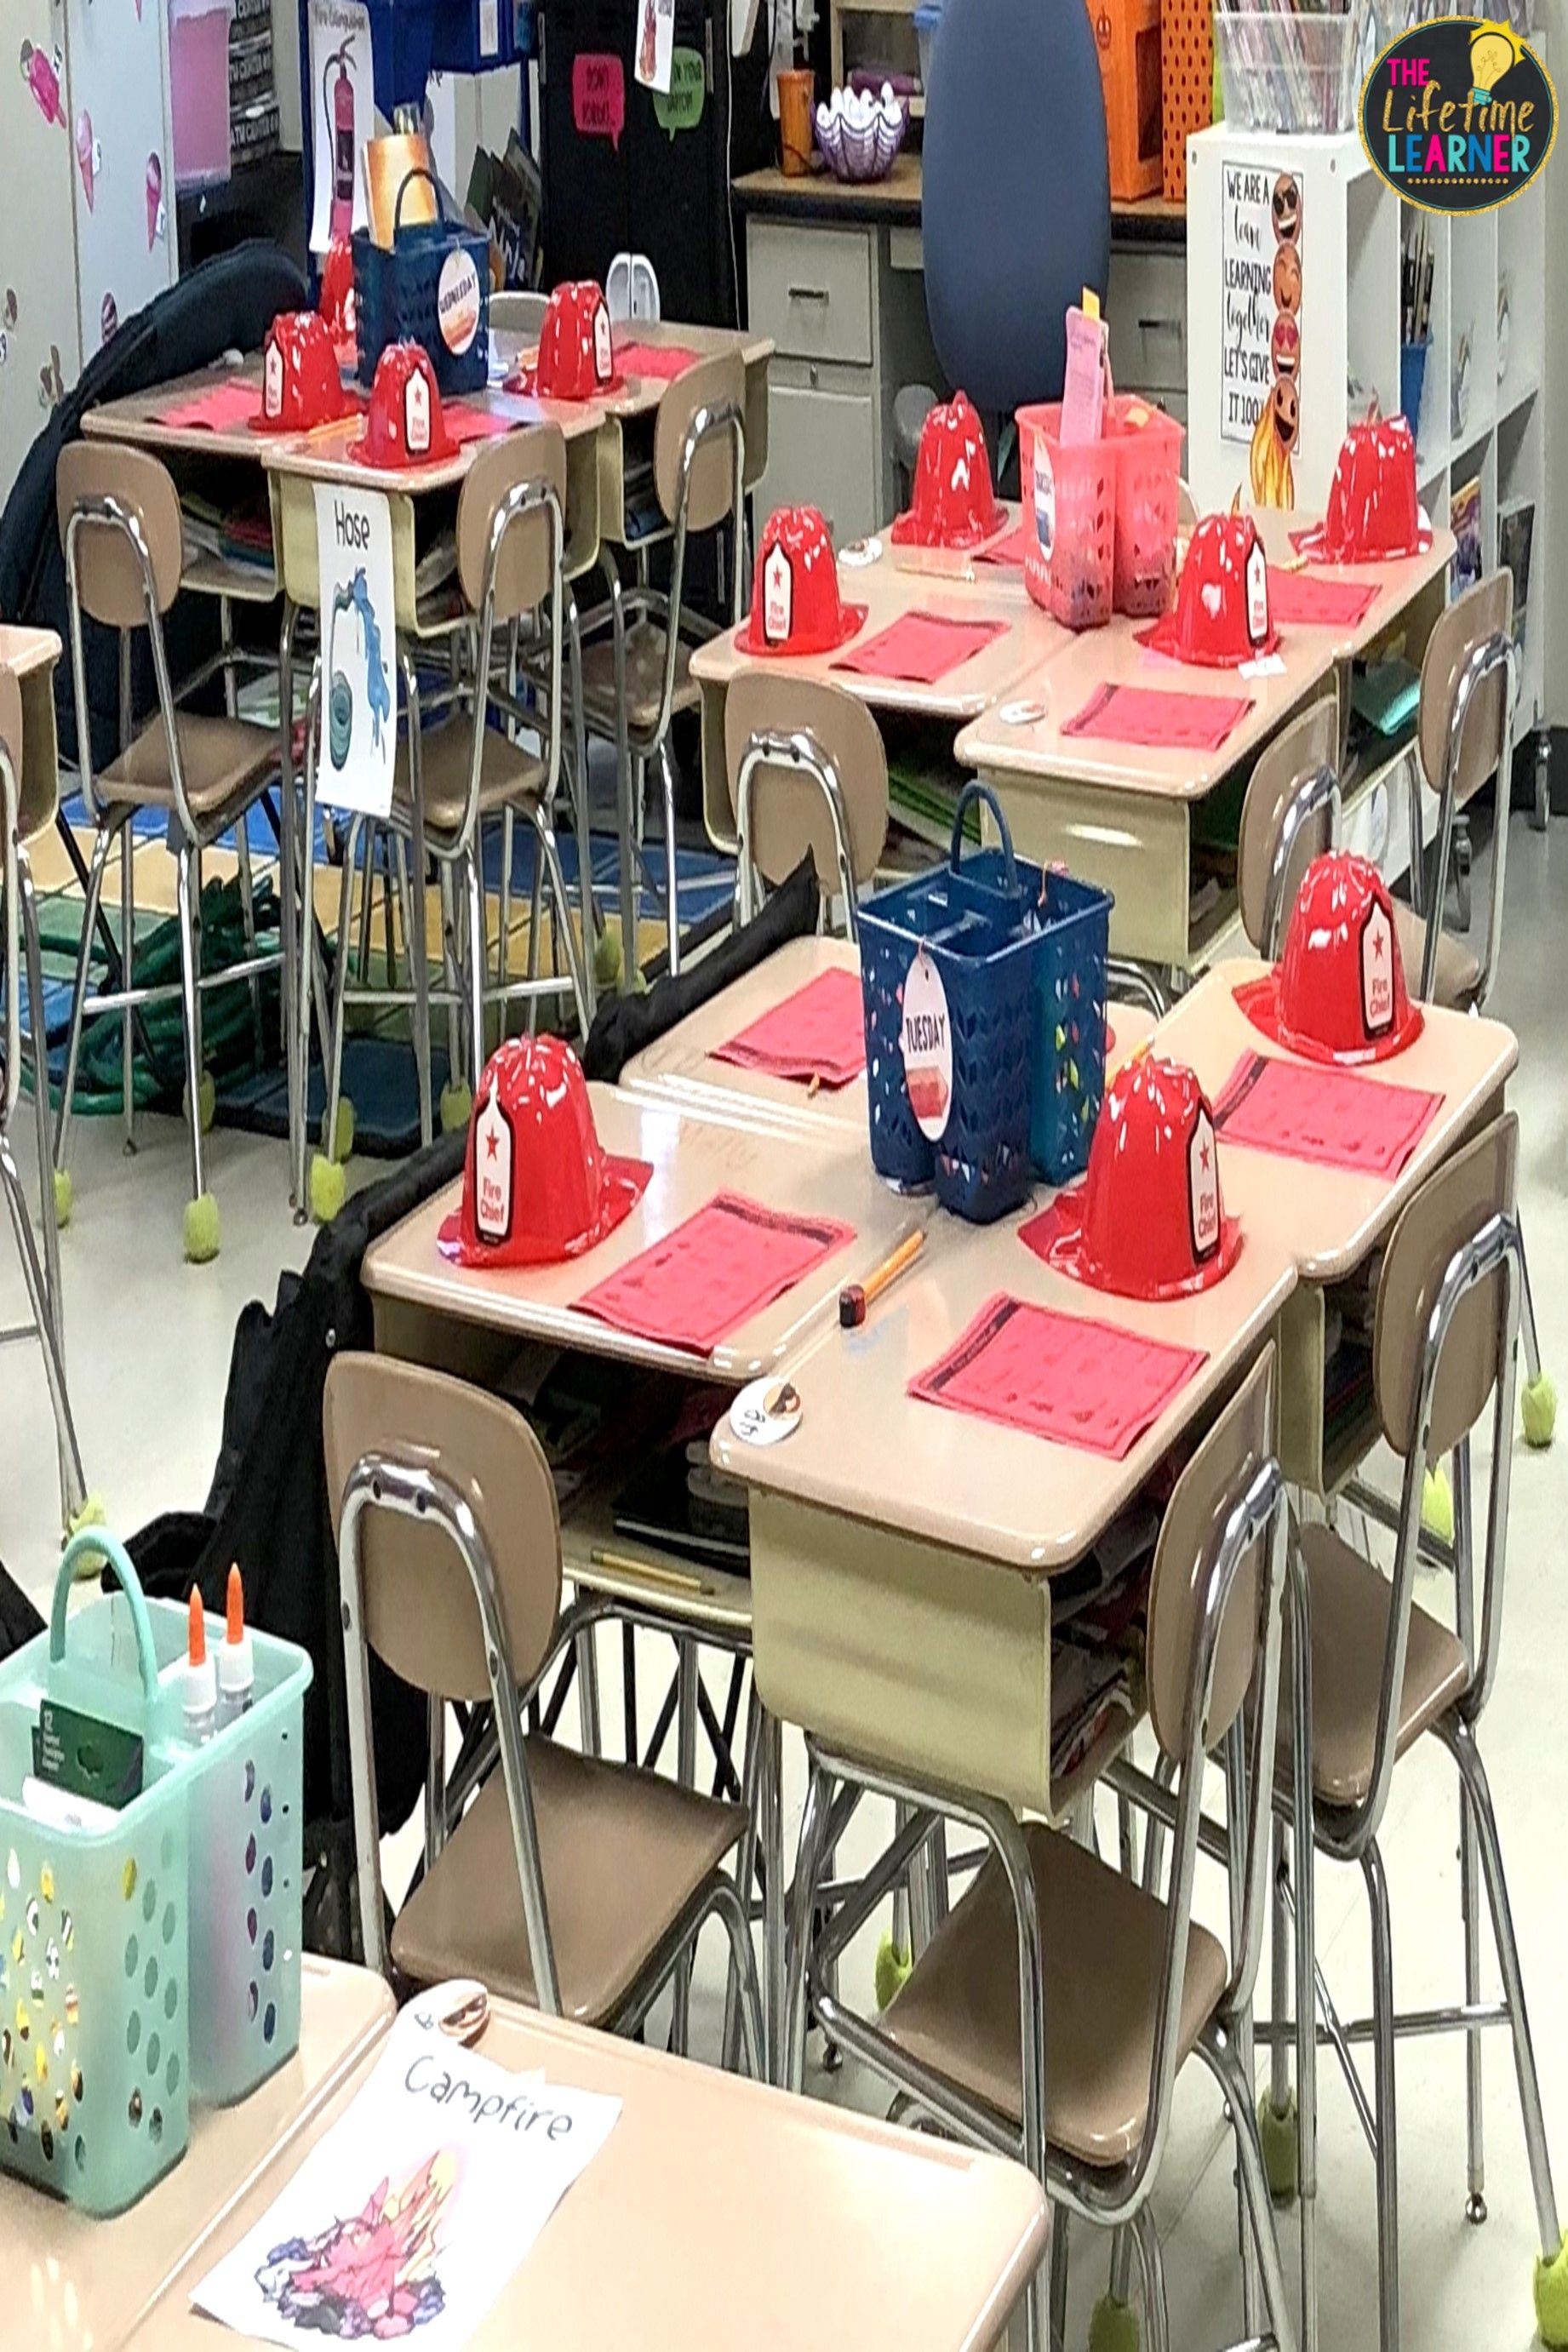 Firefighter Classroom Transformation